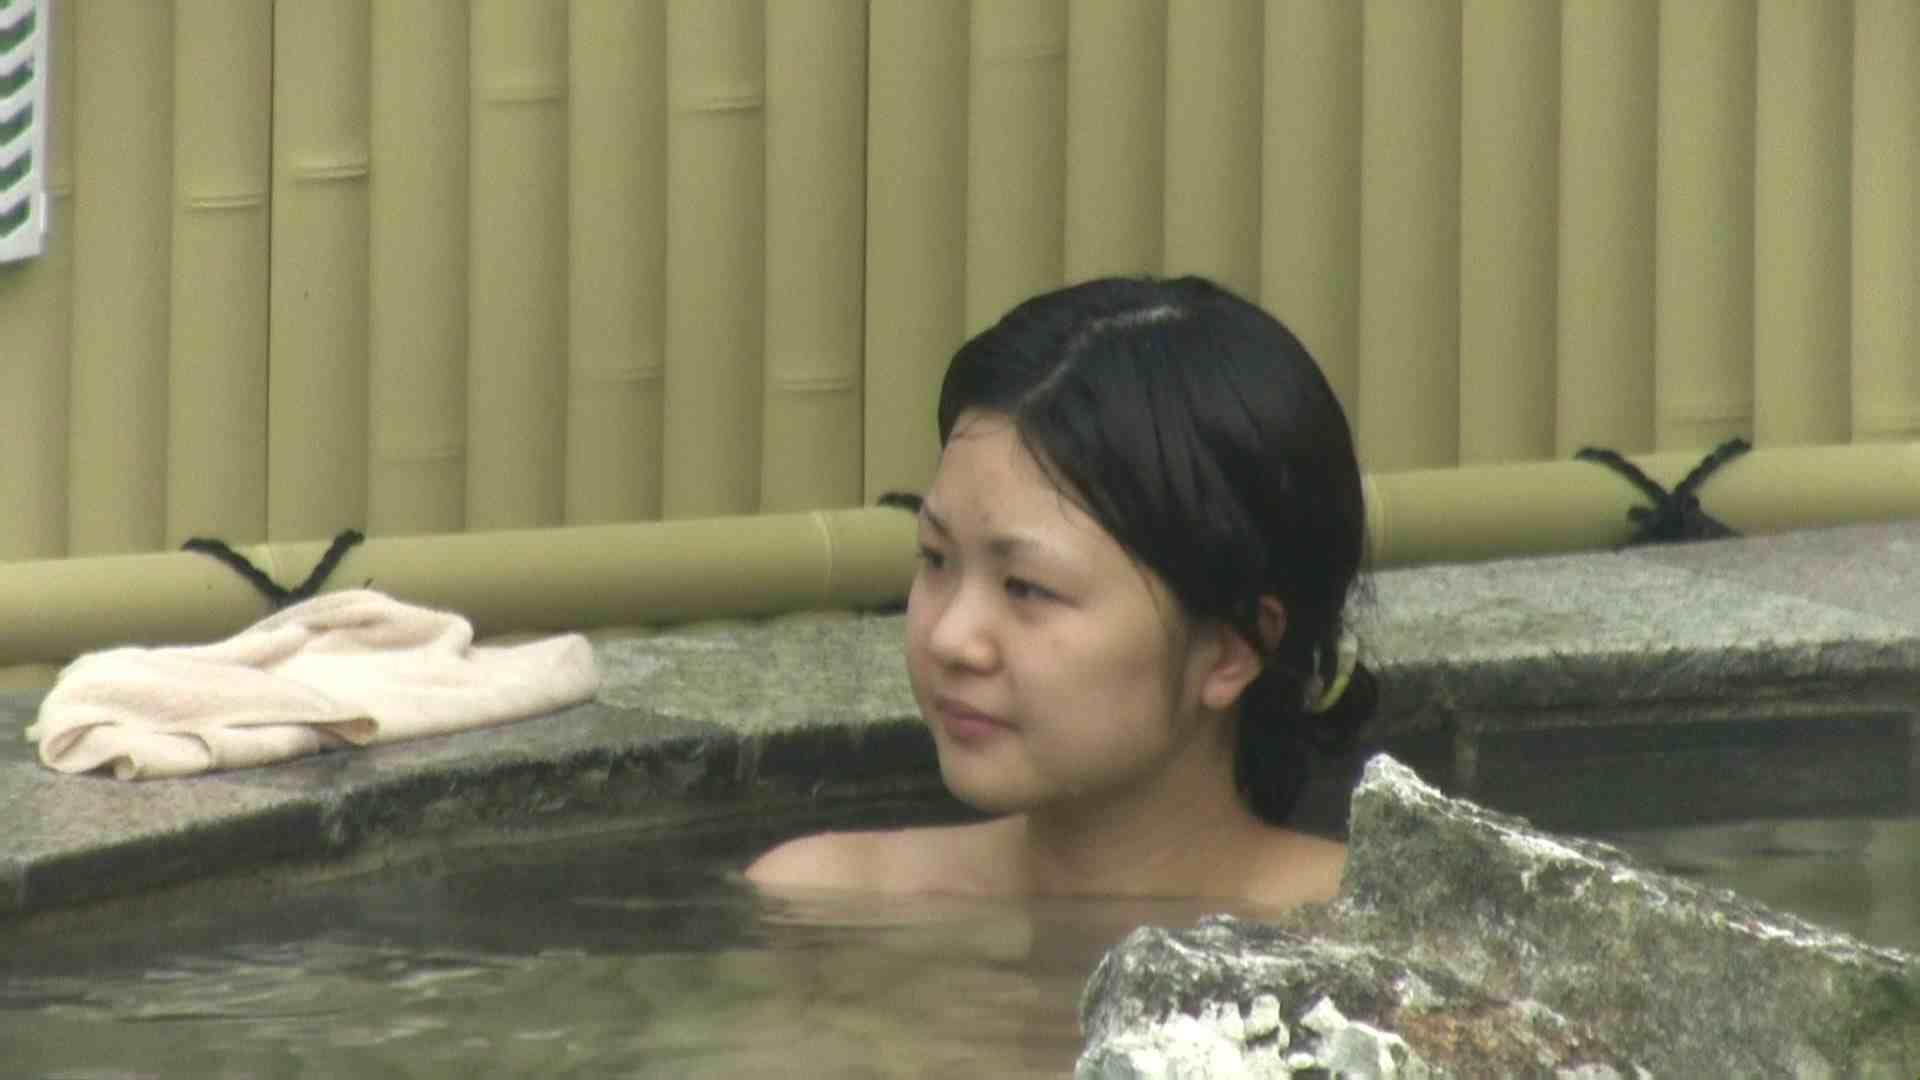 高画質露天女風呂観察 vol.032 女風呂 | OLのエロ生活  101連発 50